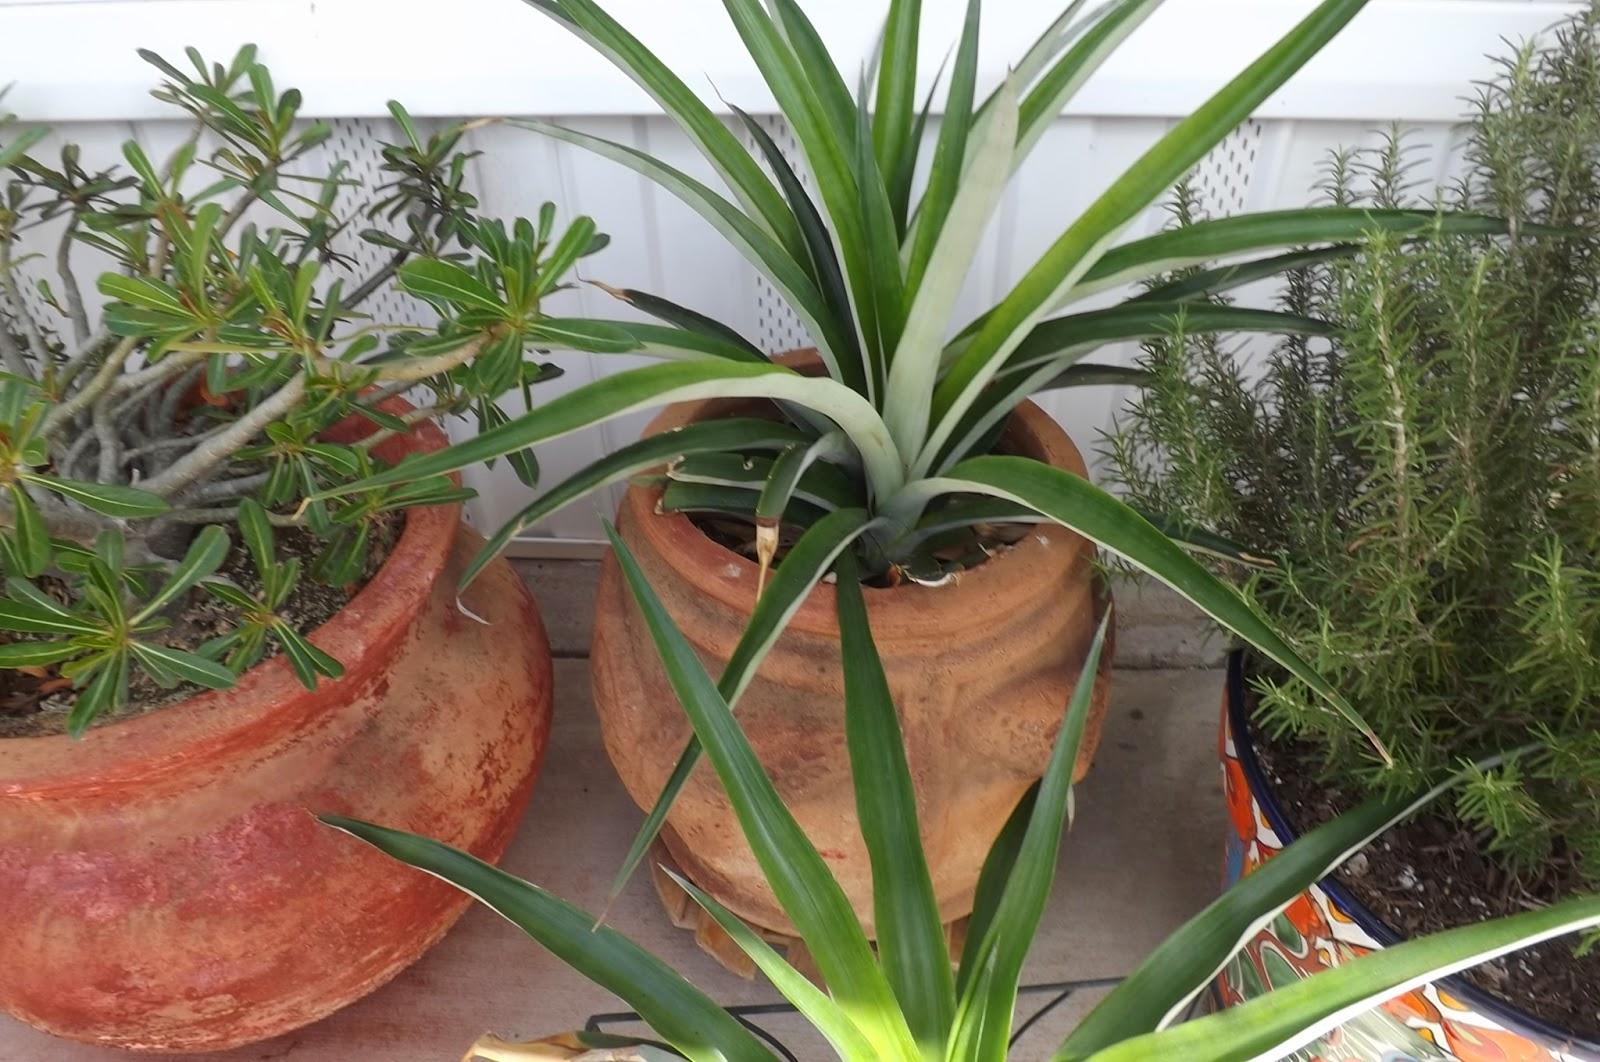 Donnas Ramblings At Rve Ornamental Pineapple Plants